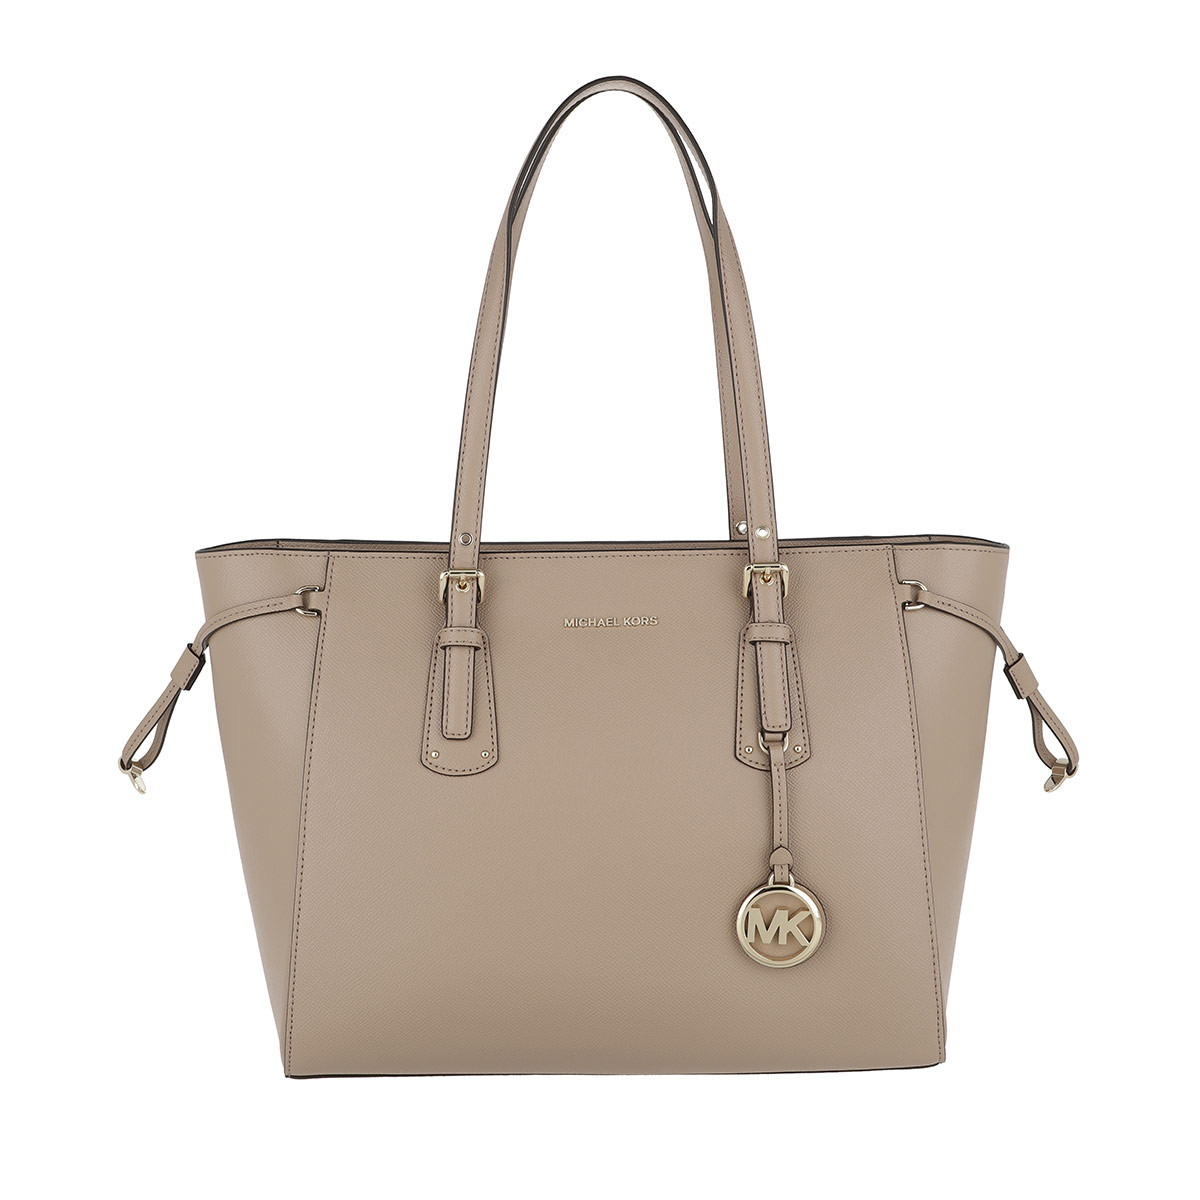 2d69c334d32 Beige leren tassen online kopen | Fashionchick.nl